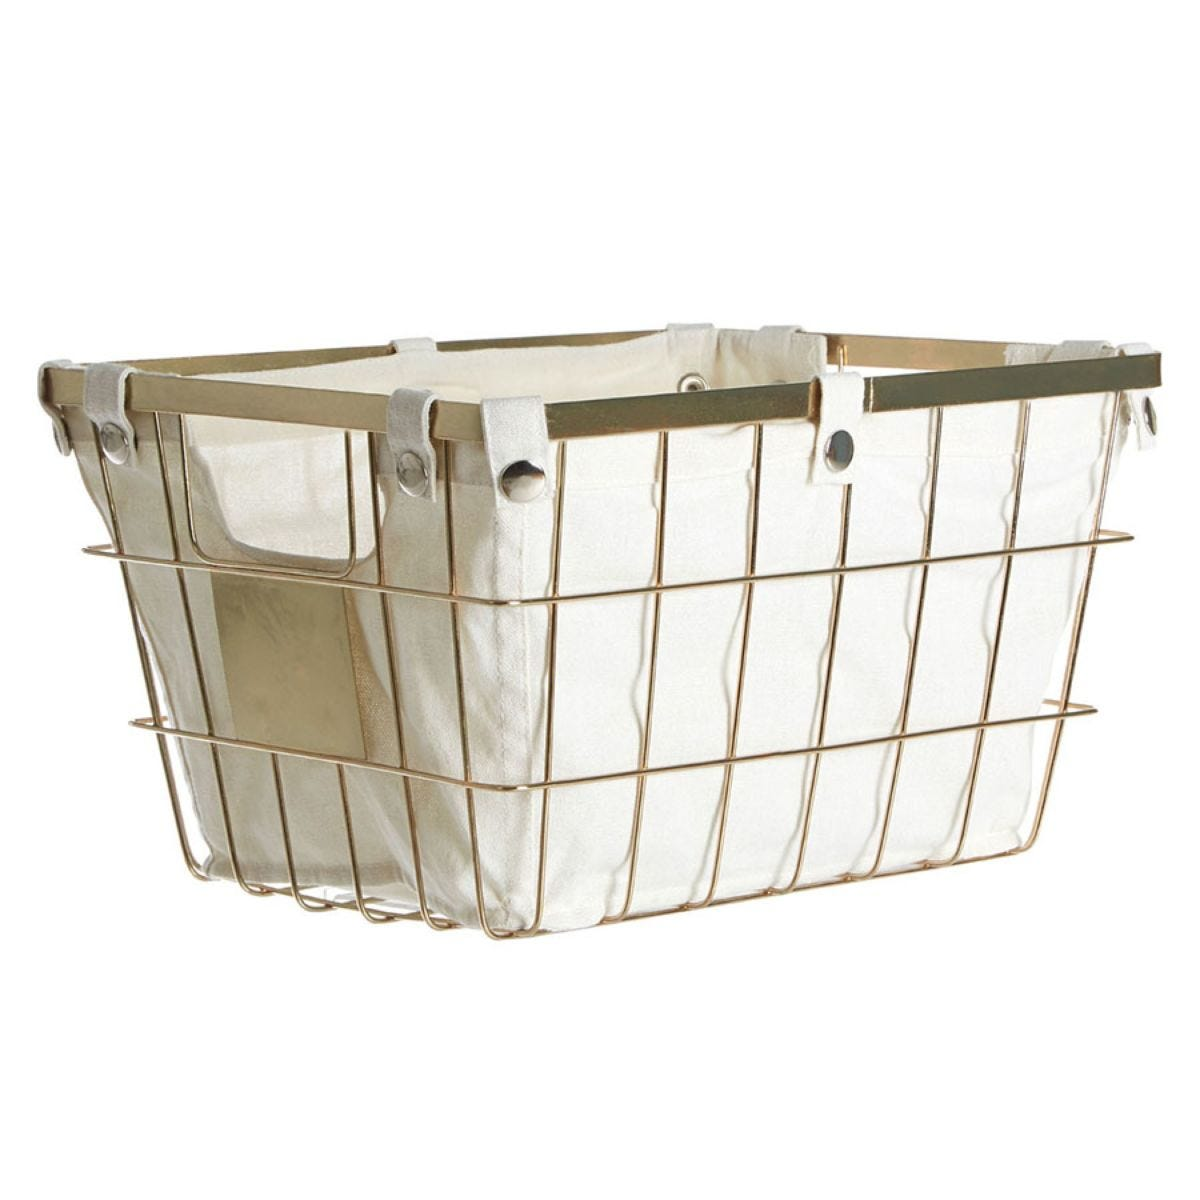 Premier Housewares Wire Storage Basket with Cotton Lining - Gold